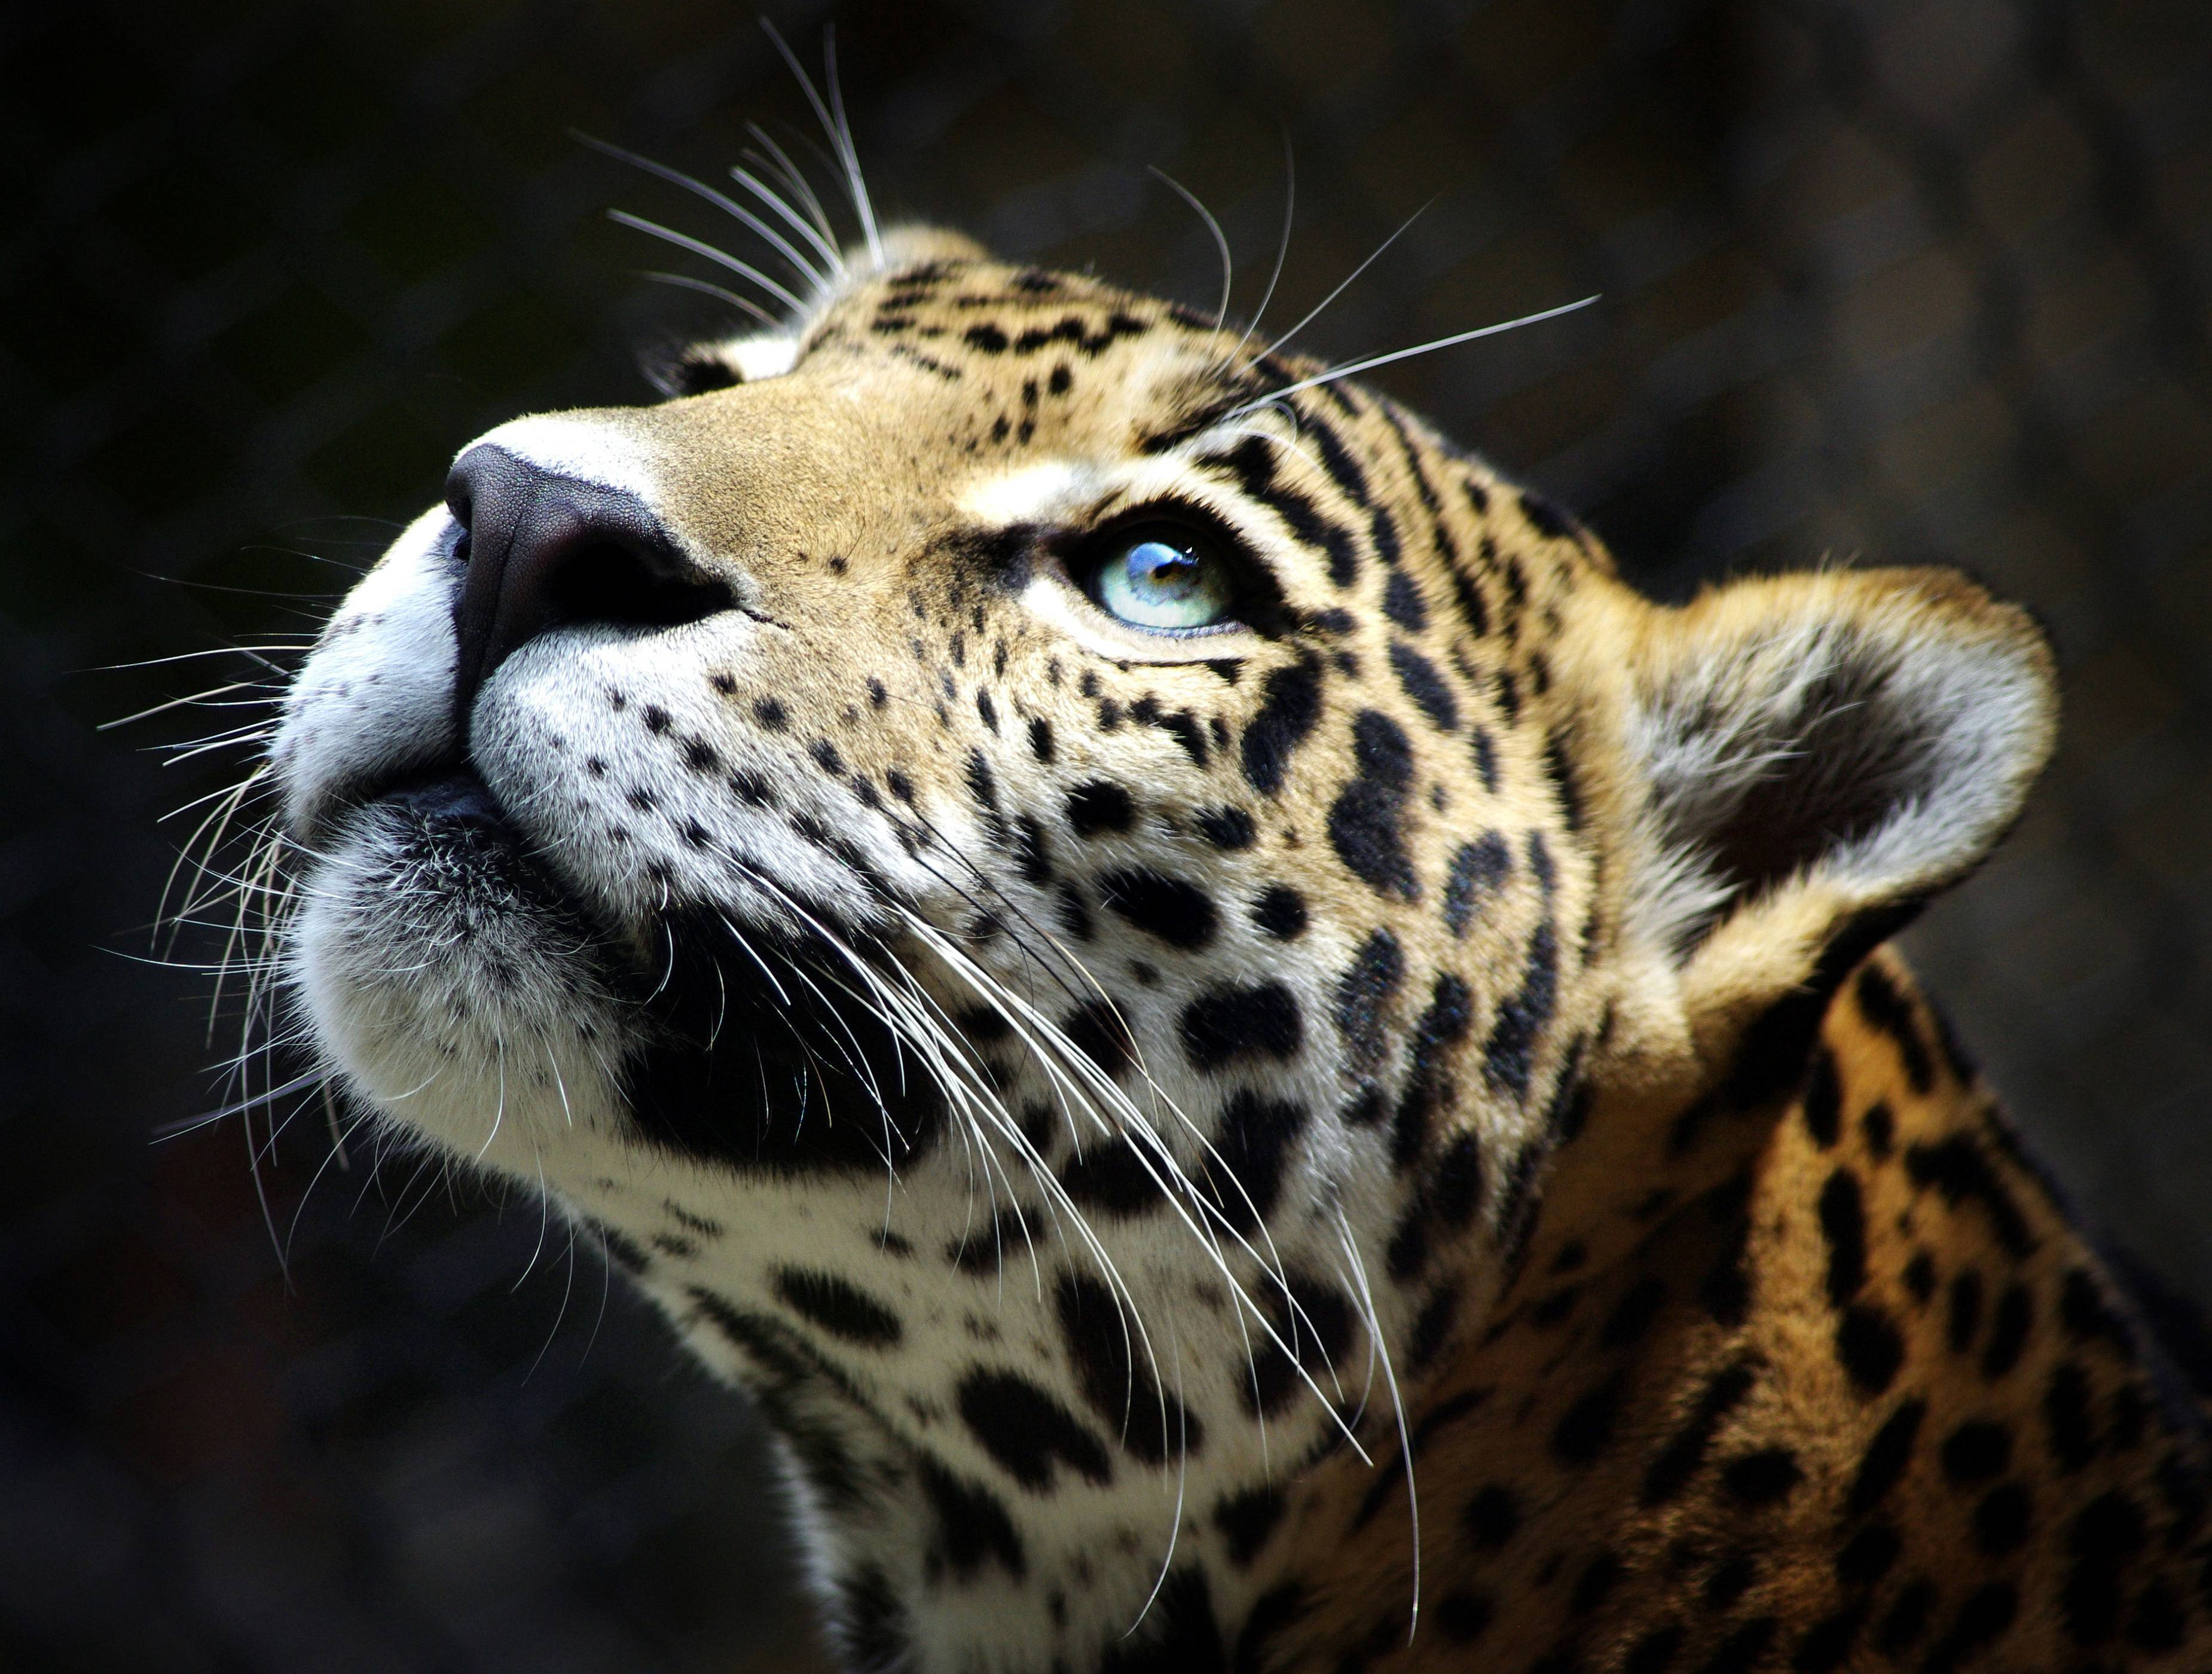 Leopard Wallpapers 3700x2800